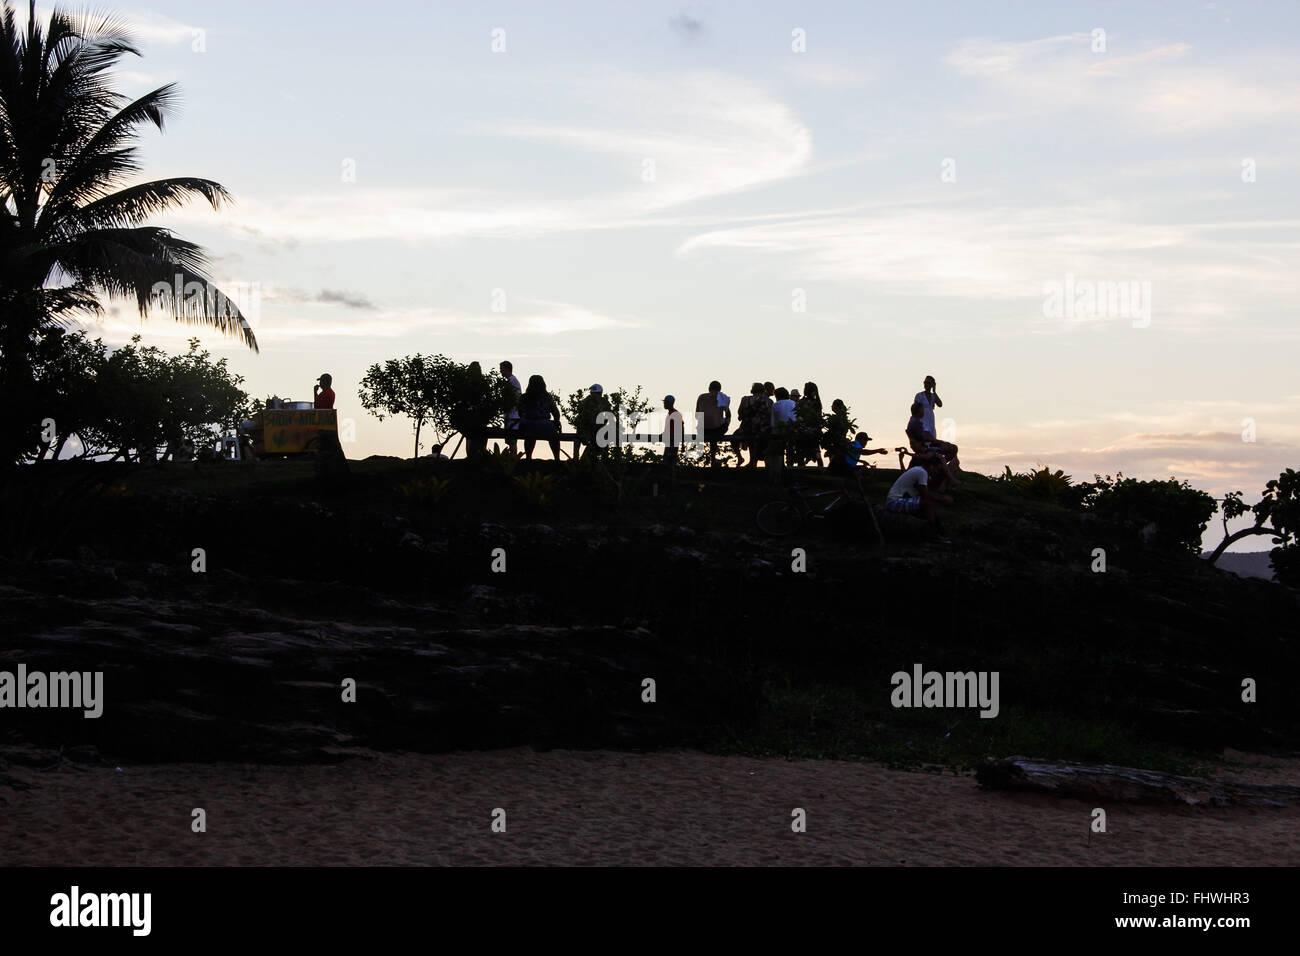 Tourists contemplating a sunset viewpoint in Ponta do xareu in Praia da Concha - Stock Image